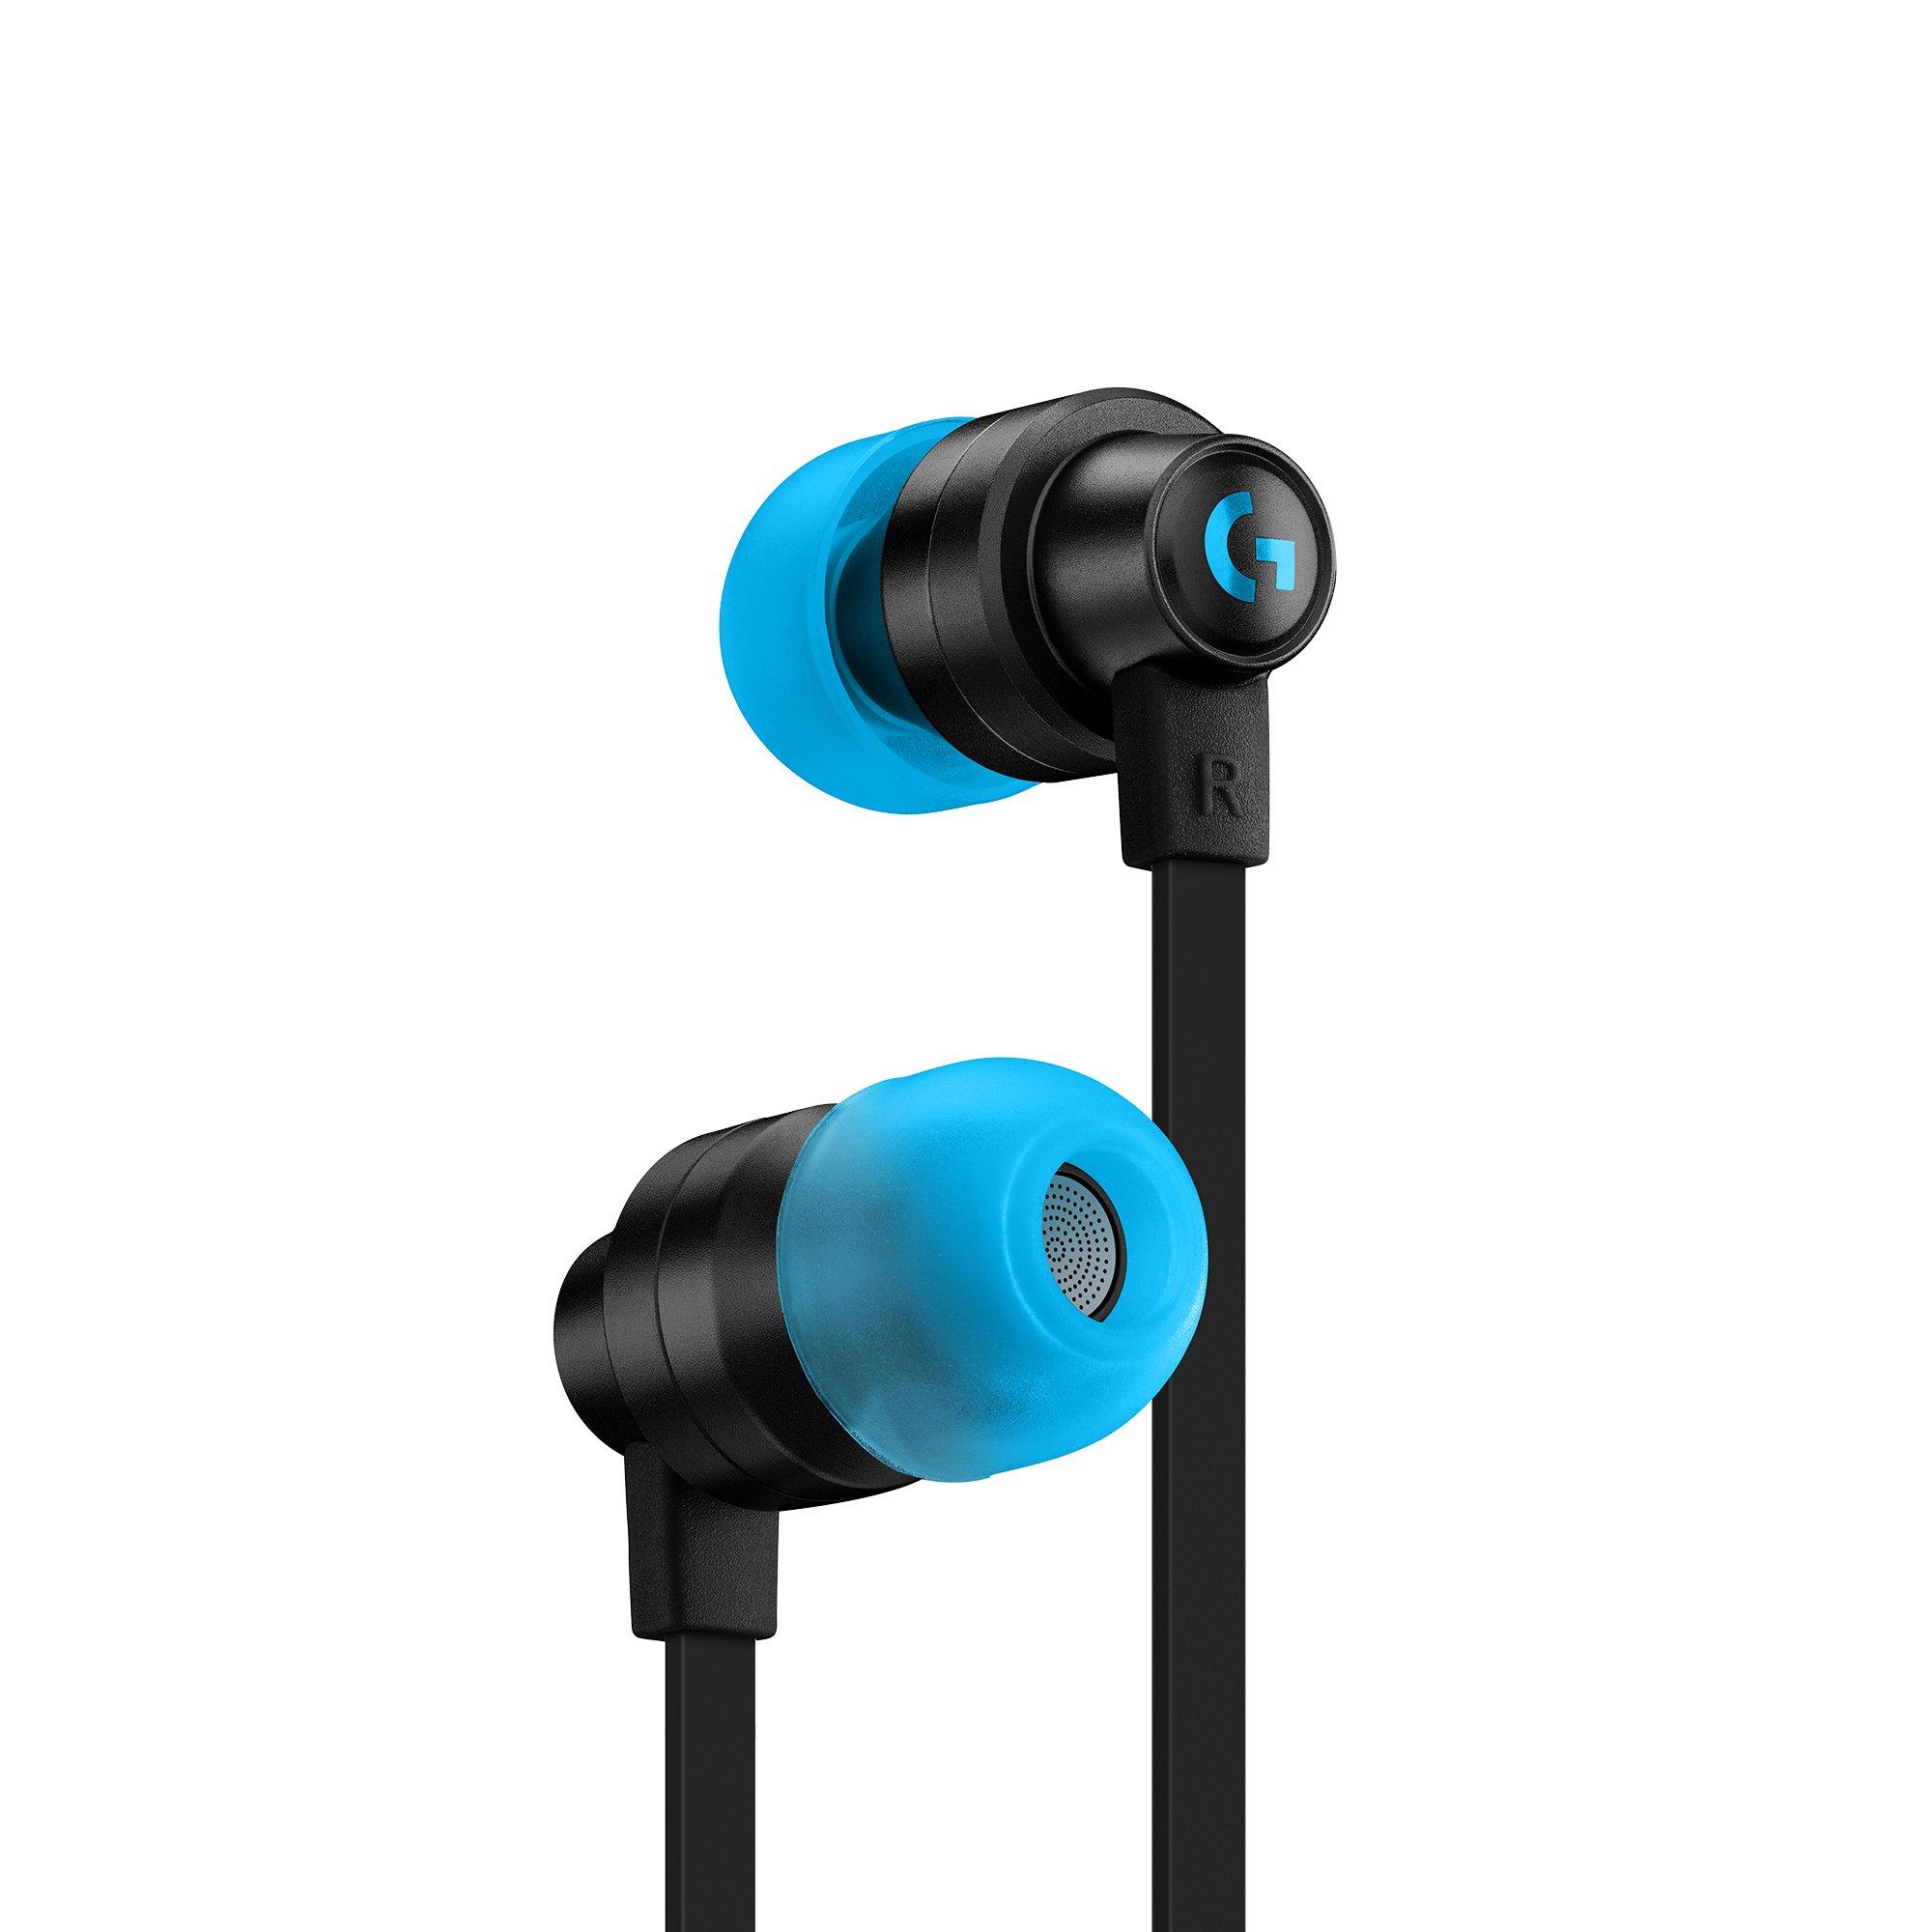 Logitech - G333 In-ear Gaming Headphones Black